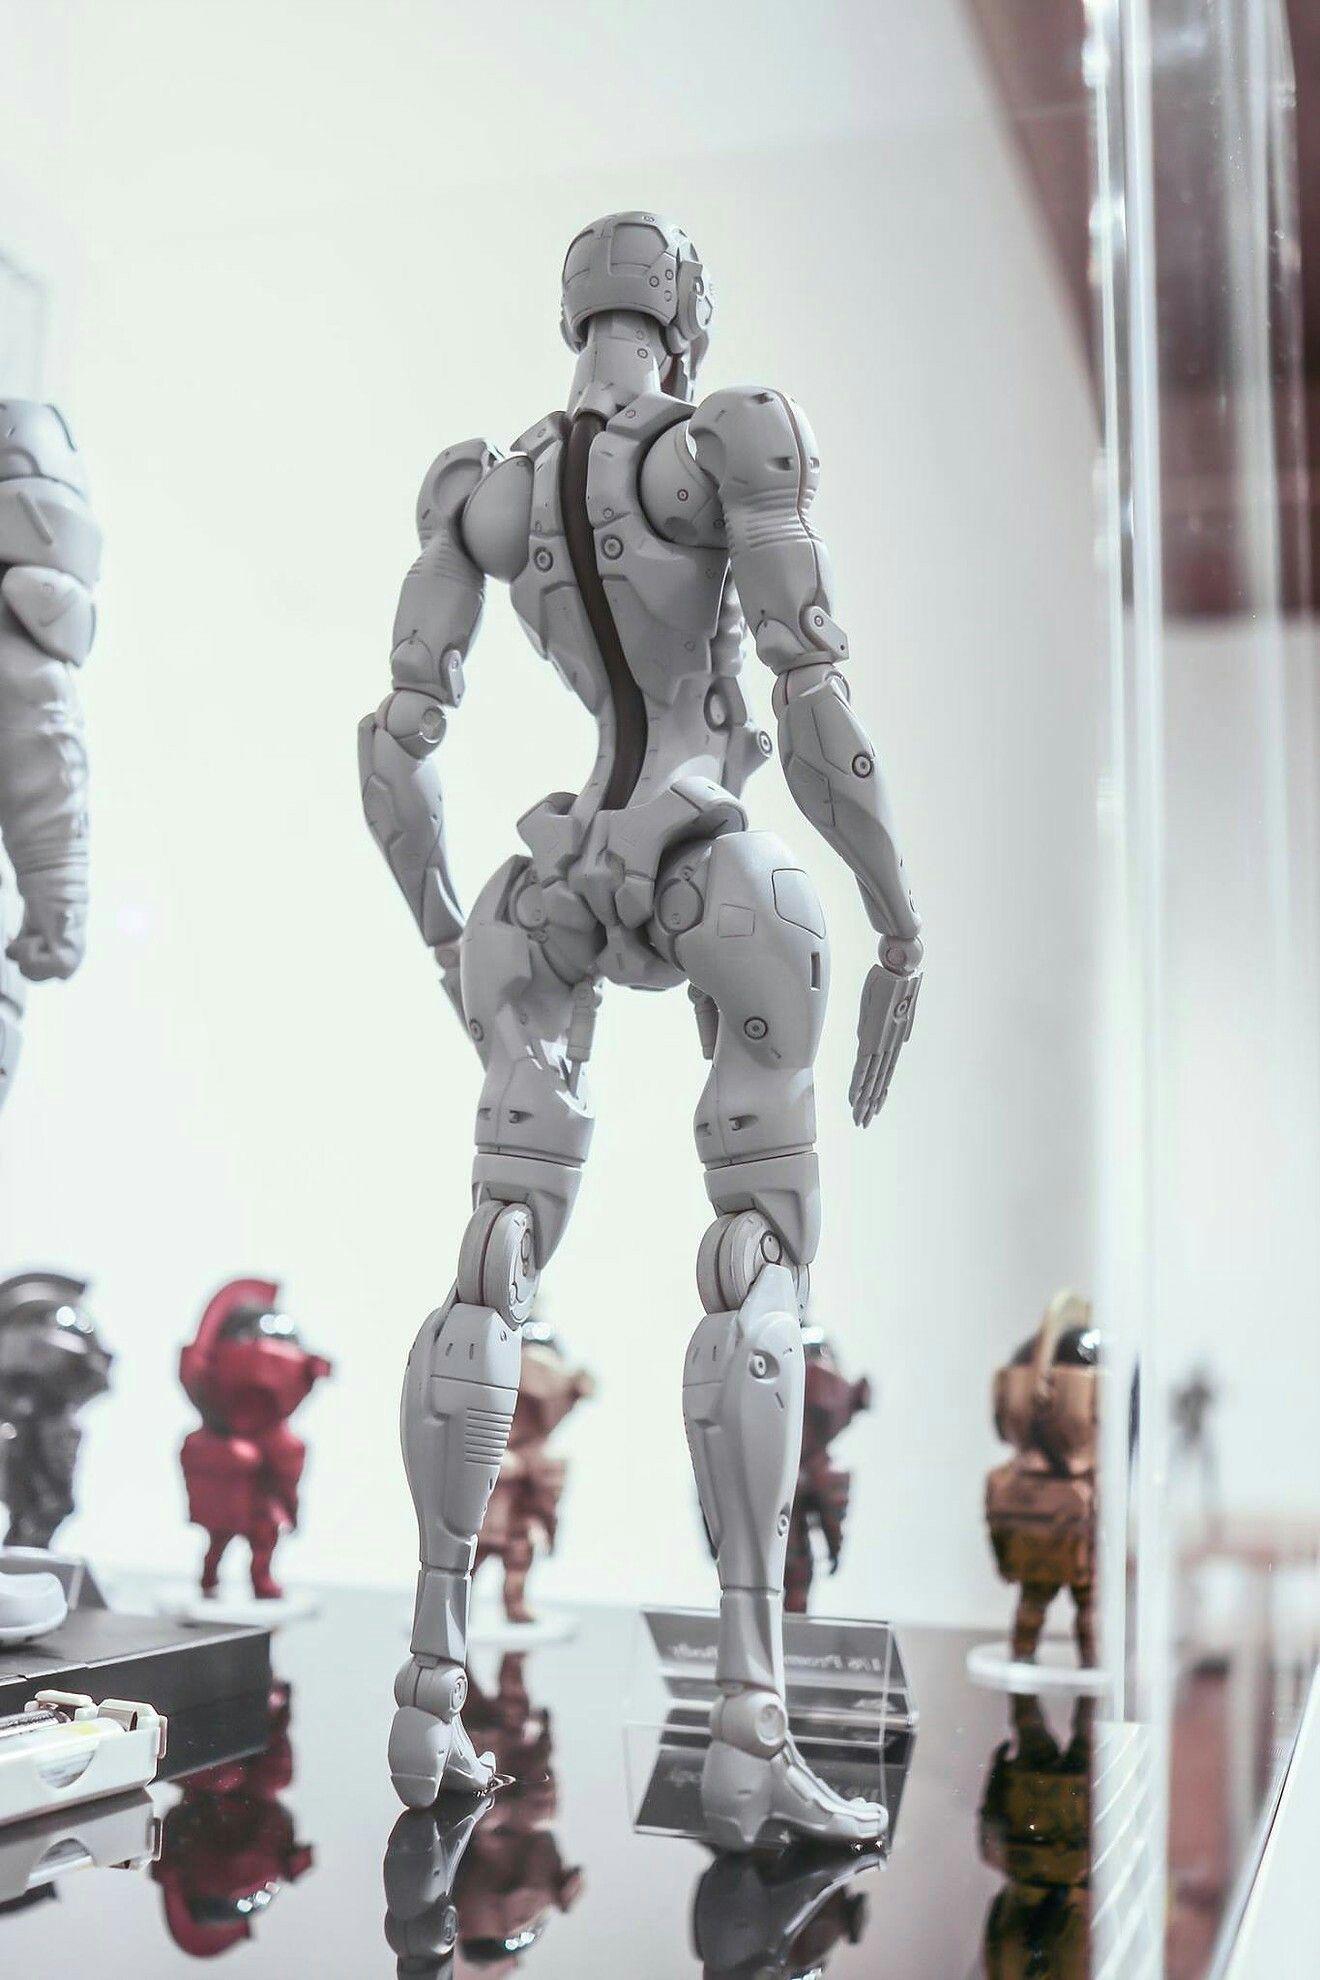 Pin De Pastel Apocaliptico Em Action Figures Arte De Robo